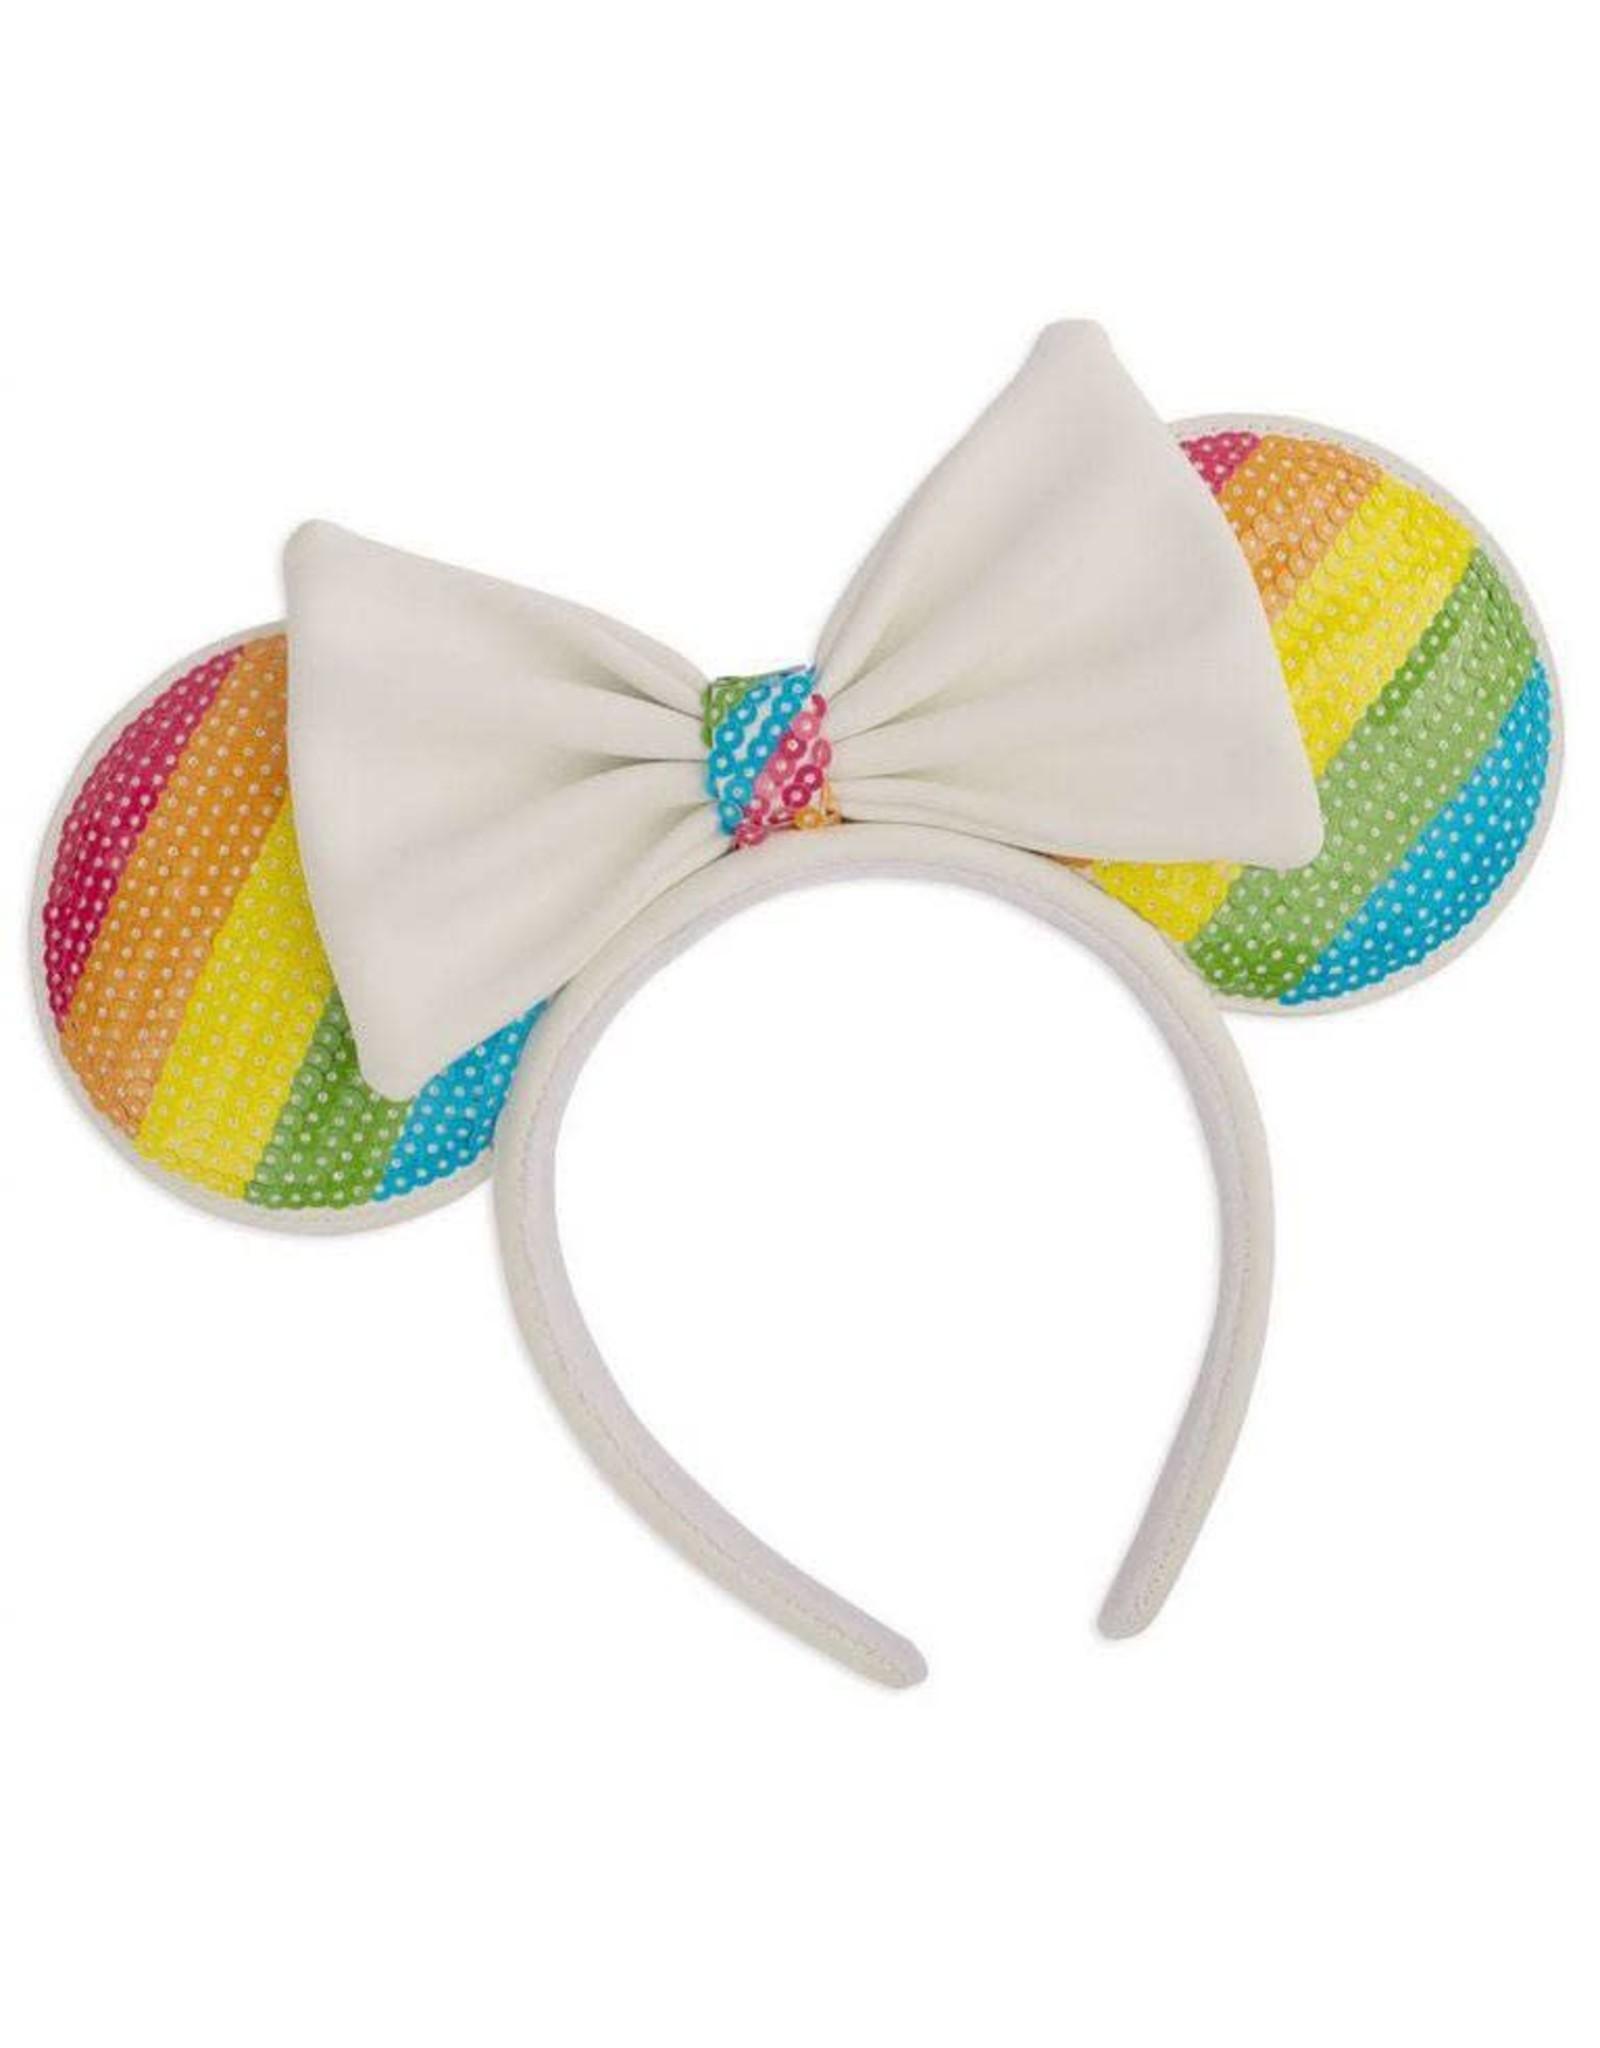 Loungefly MINNIE MOUSE Headband - Sequin Rainbow